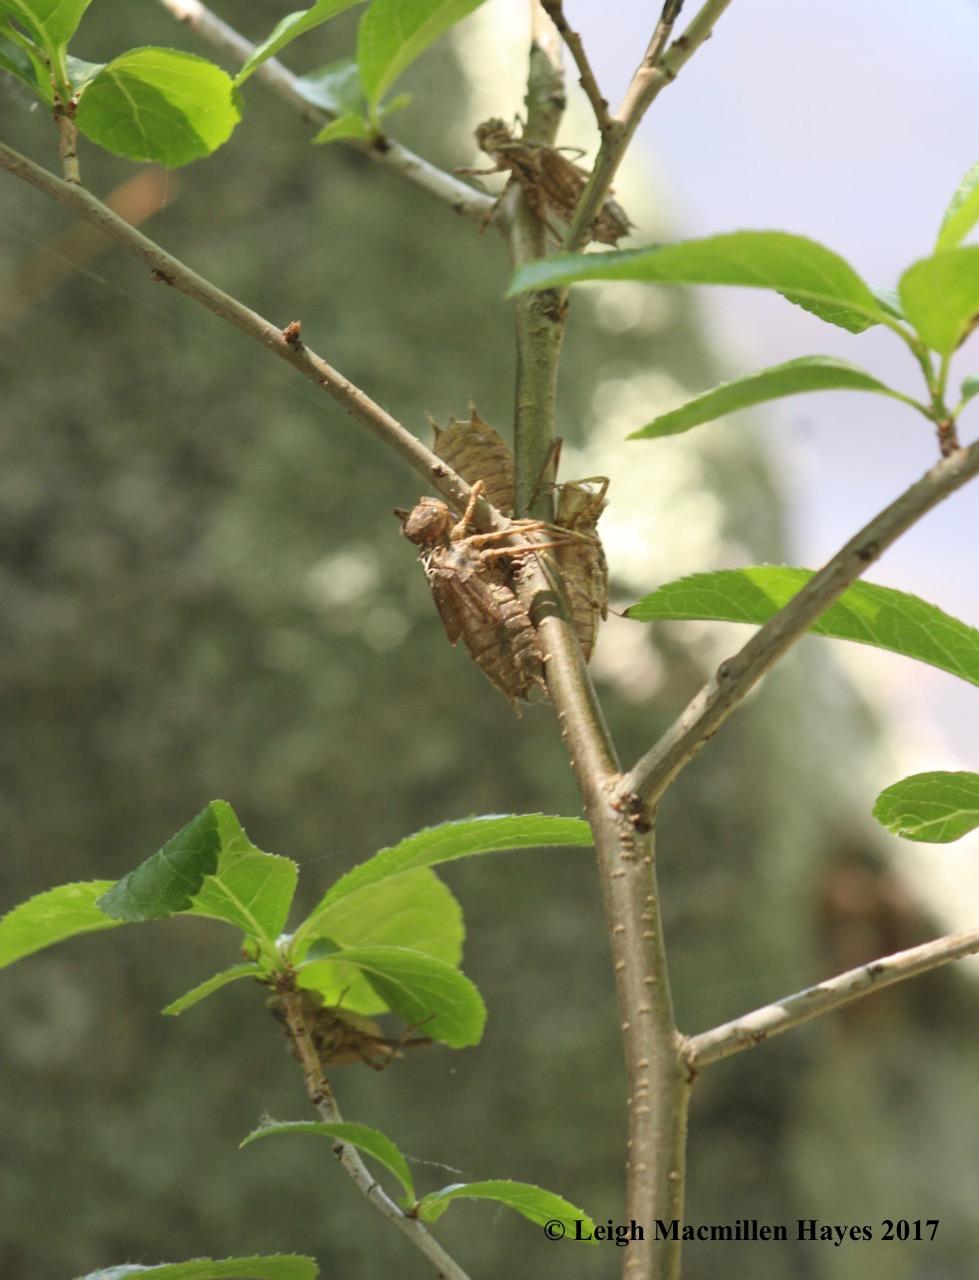 h-exoskeltons on shrub